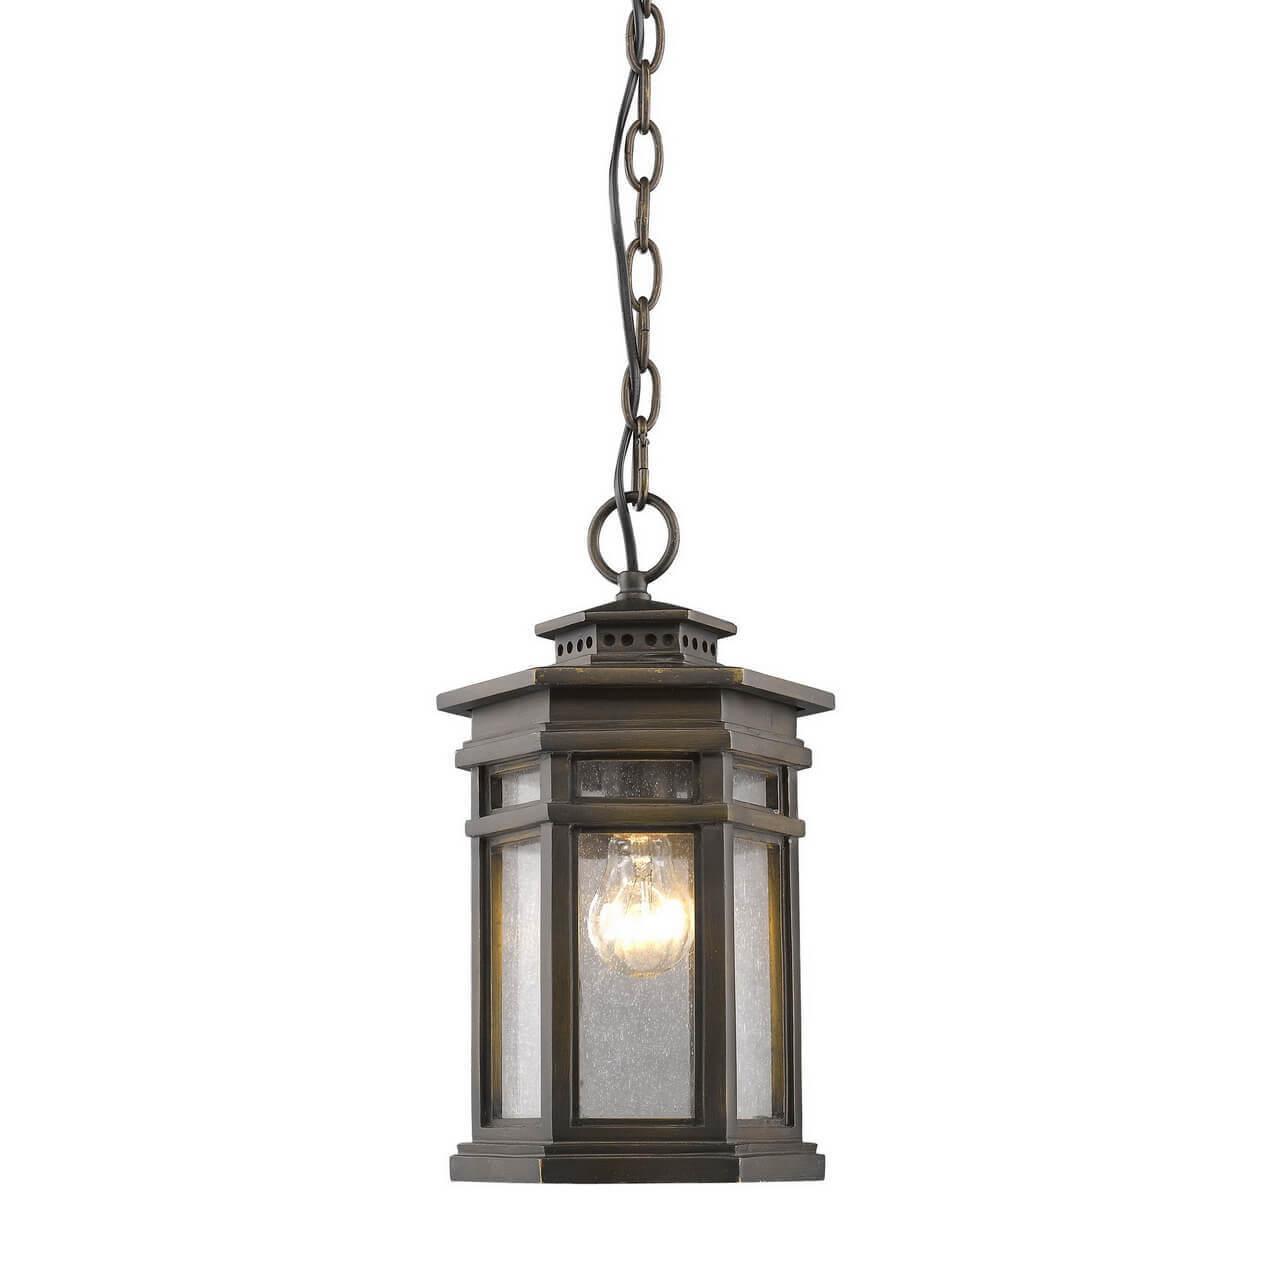 Уличный светильник Favourite 1458-1P, E27